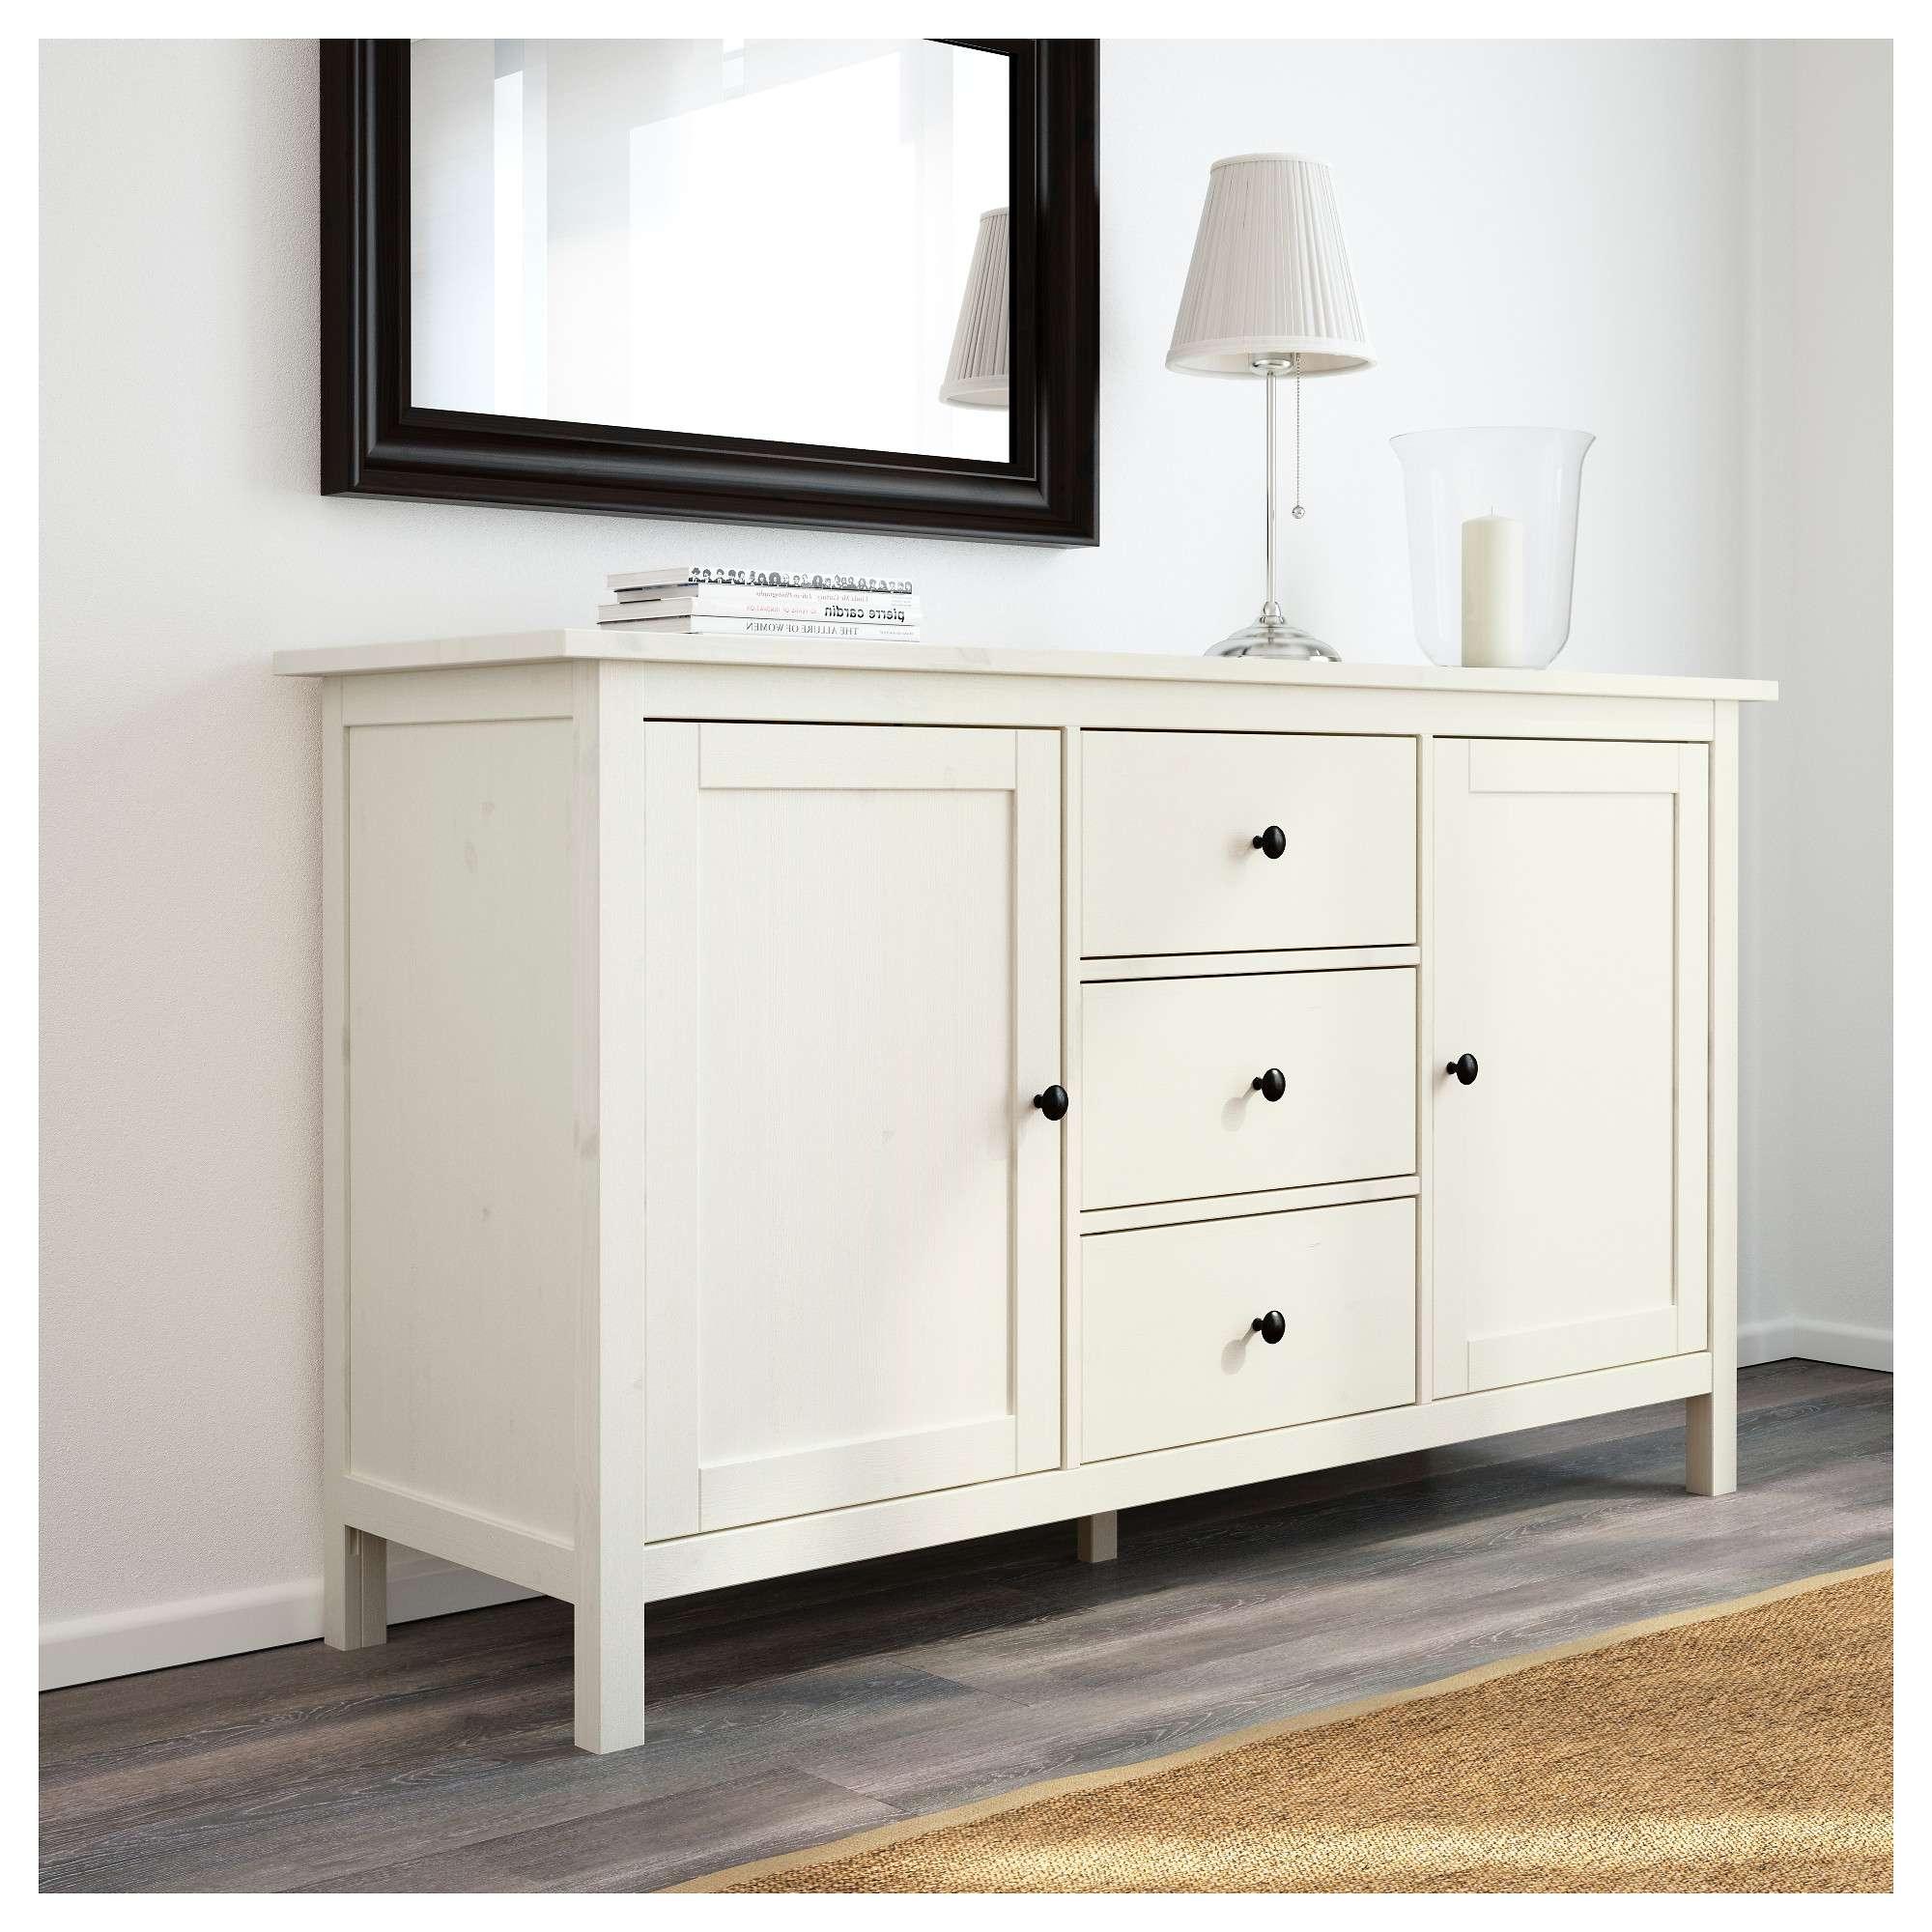 Hemnes Sideboard – White Stain – Ikea Inside Storage Sideboards (View 8 of 20)